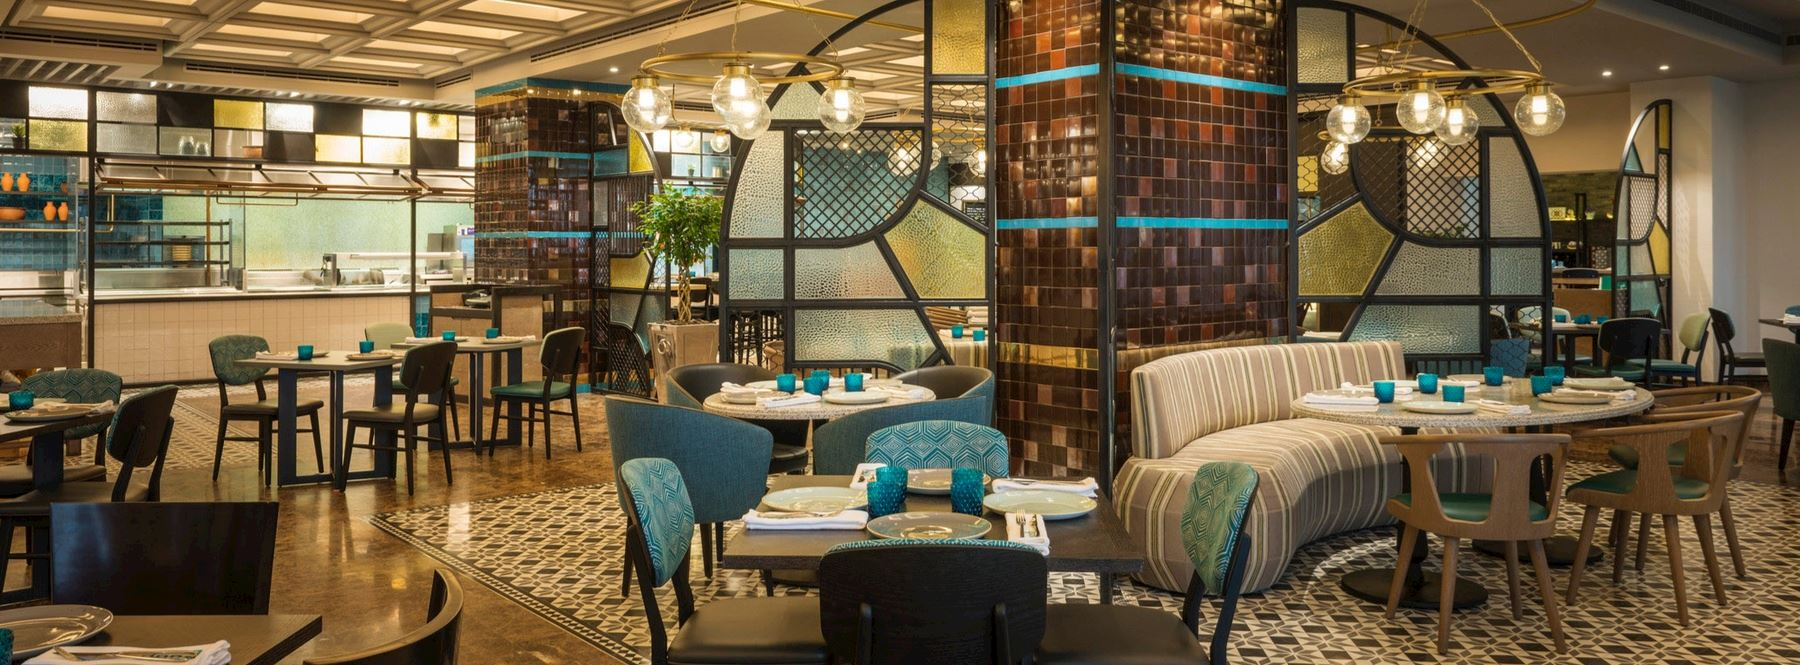 Besh Authentic Turkish Restaurant In Dubai